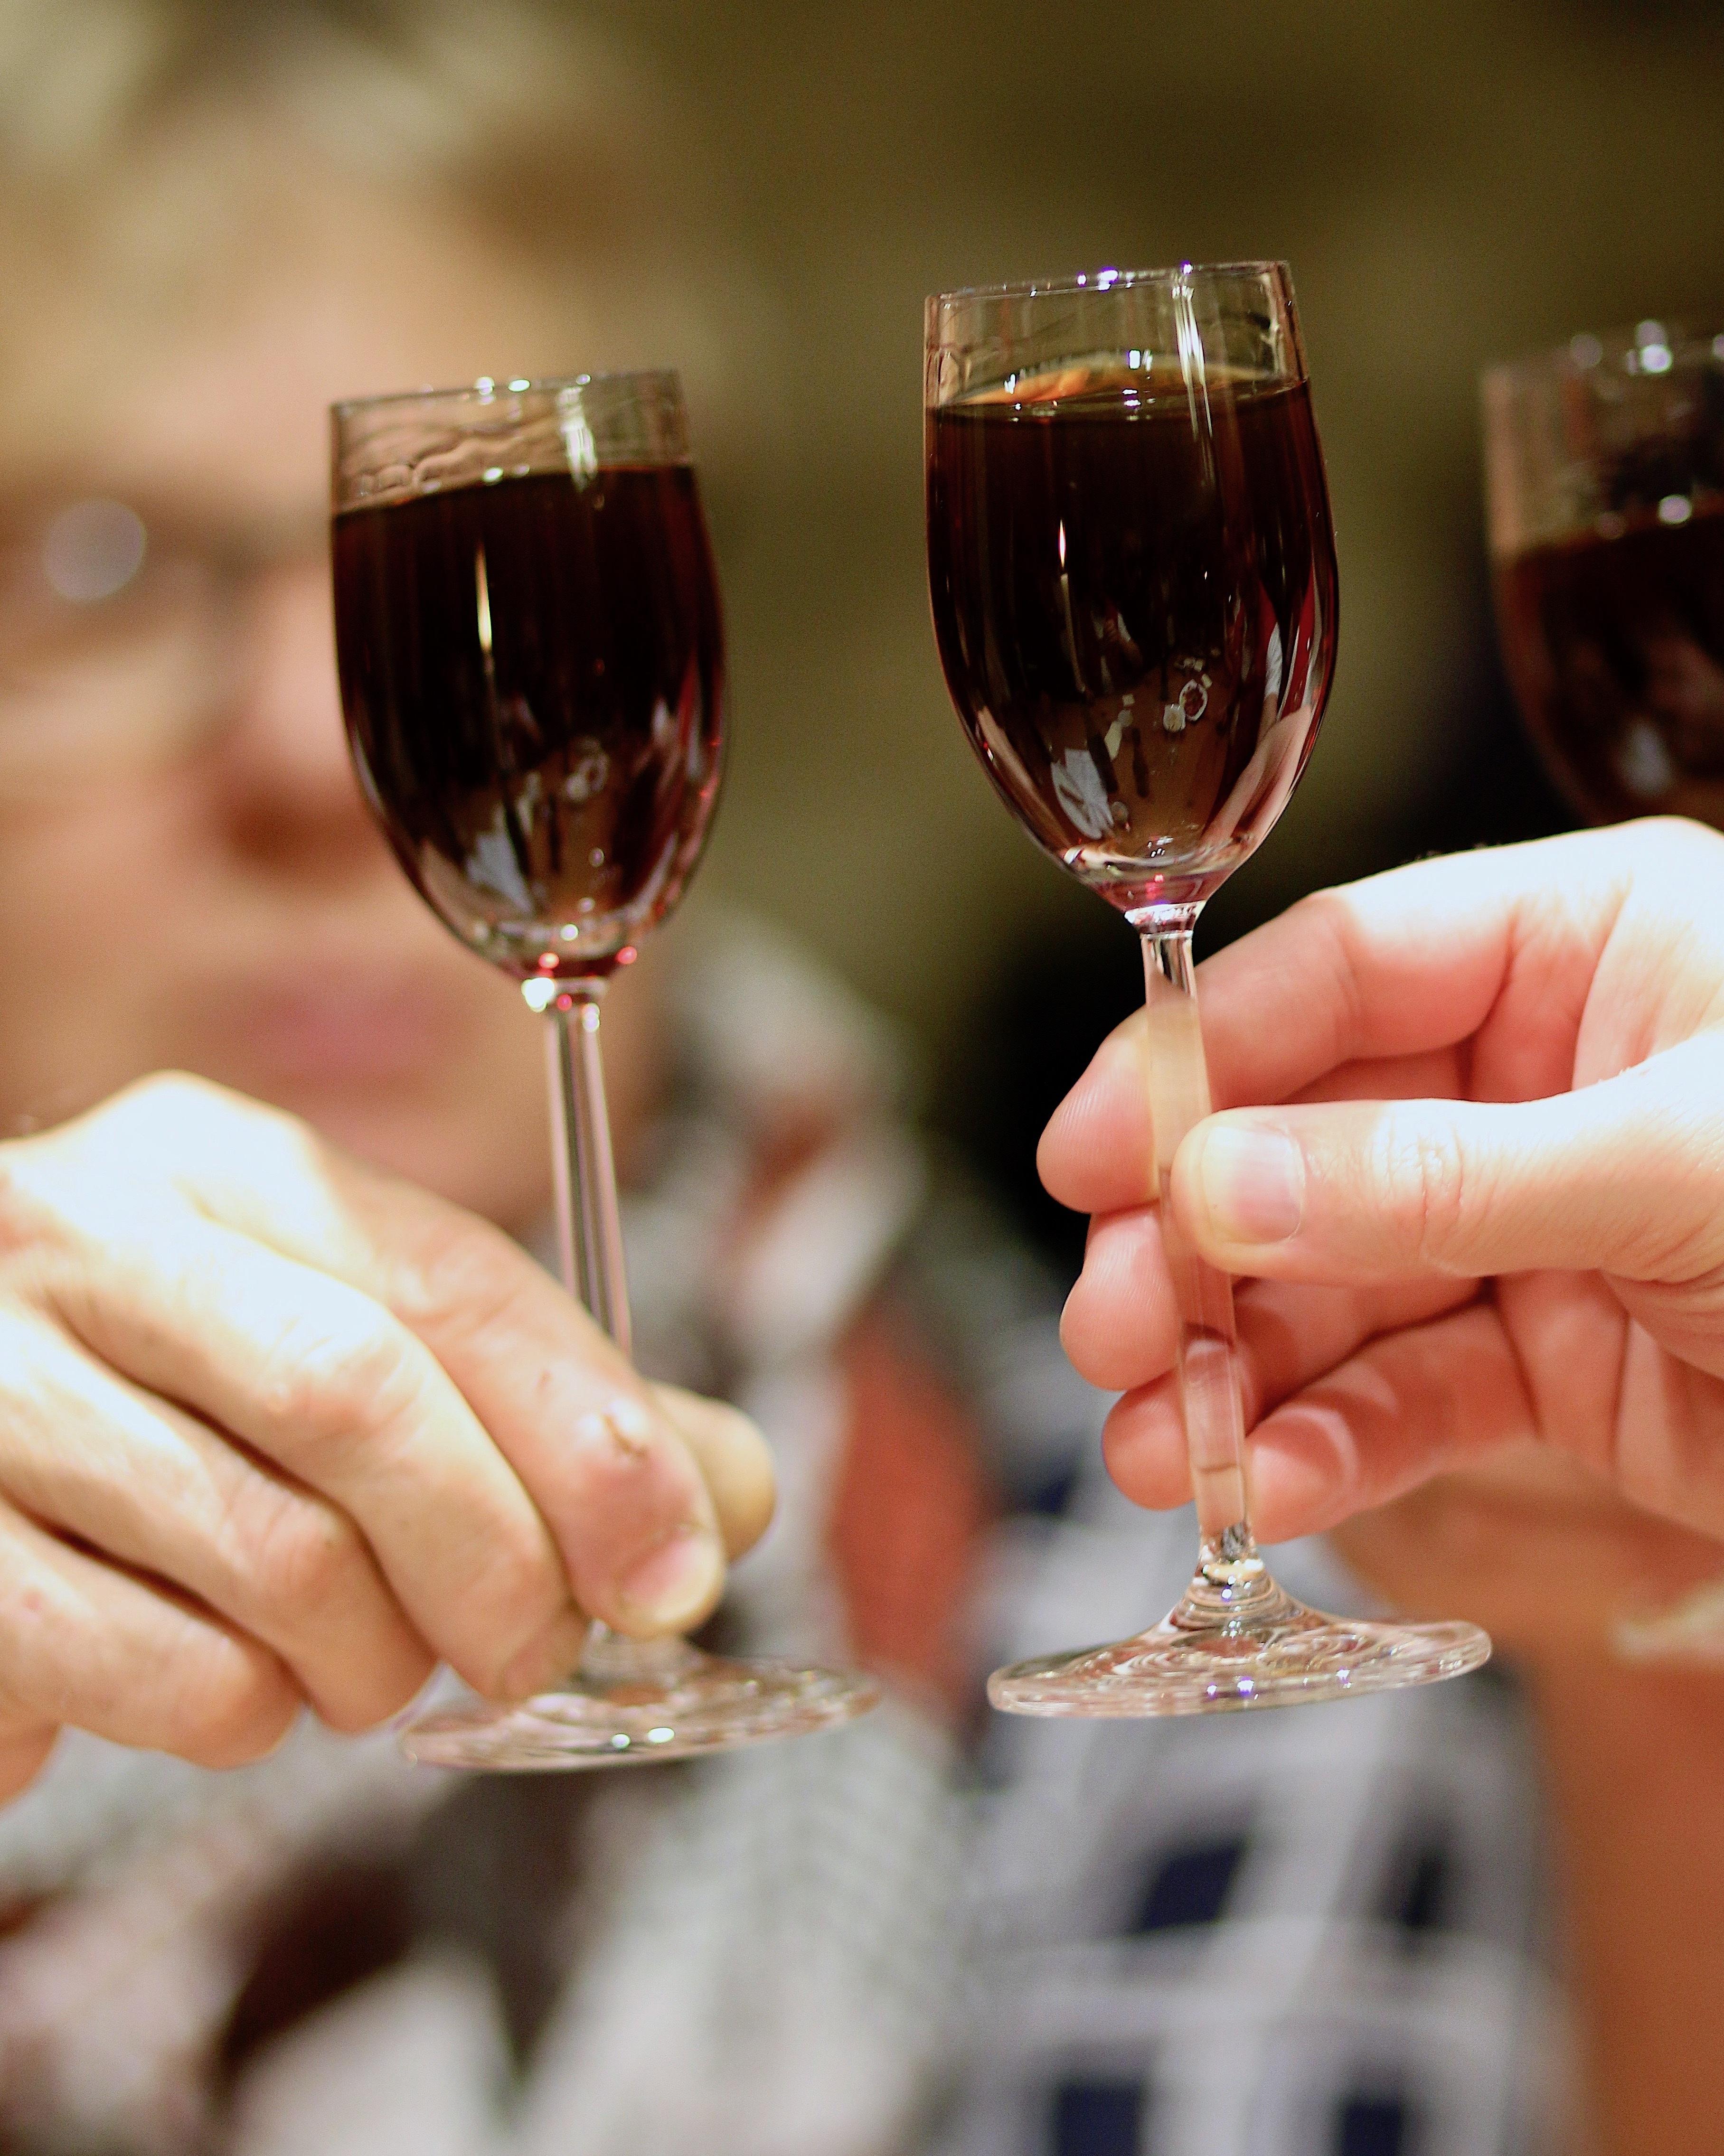 имени нури картинки по бокальчику вина экспансия